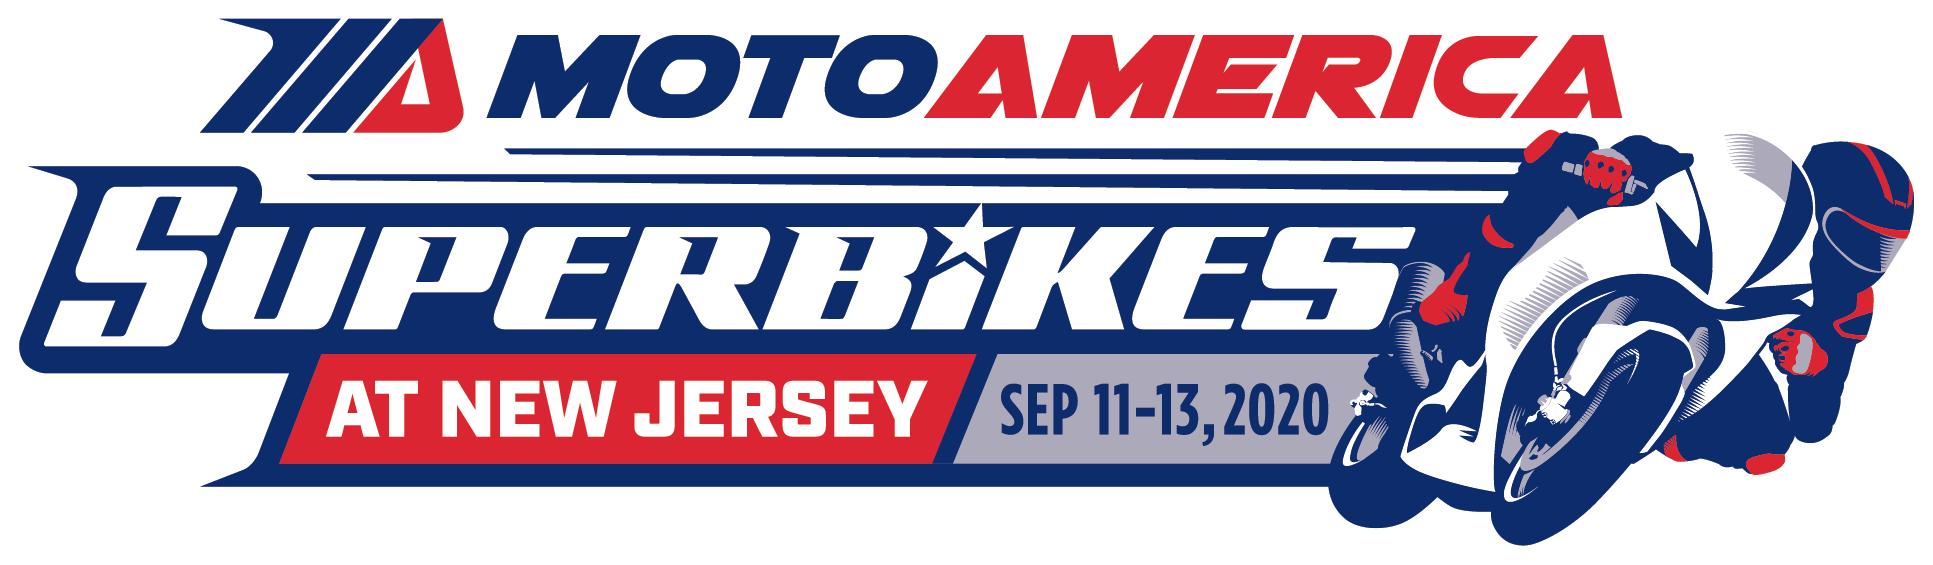 MotoAmerica Superbikes at New Jersey- September 11-13, 2020